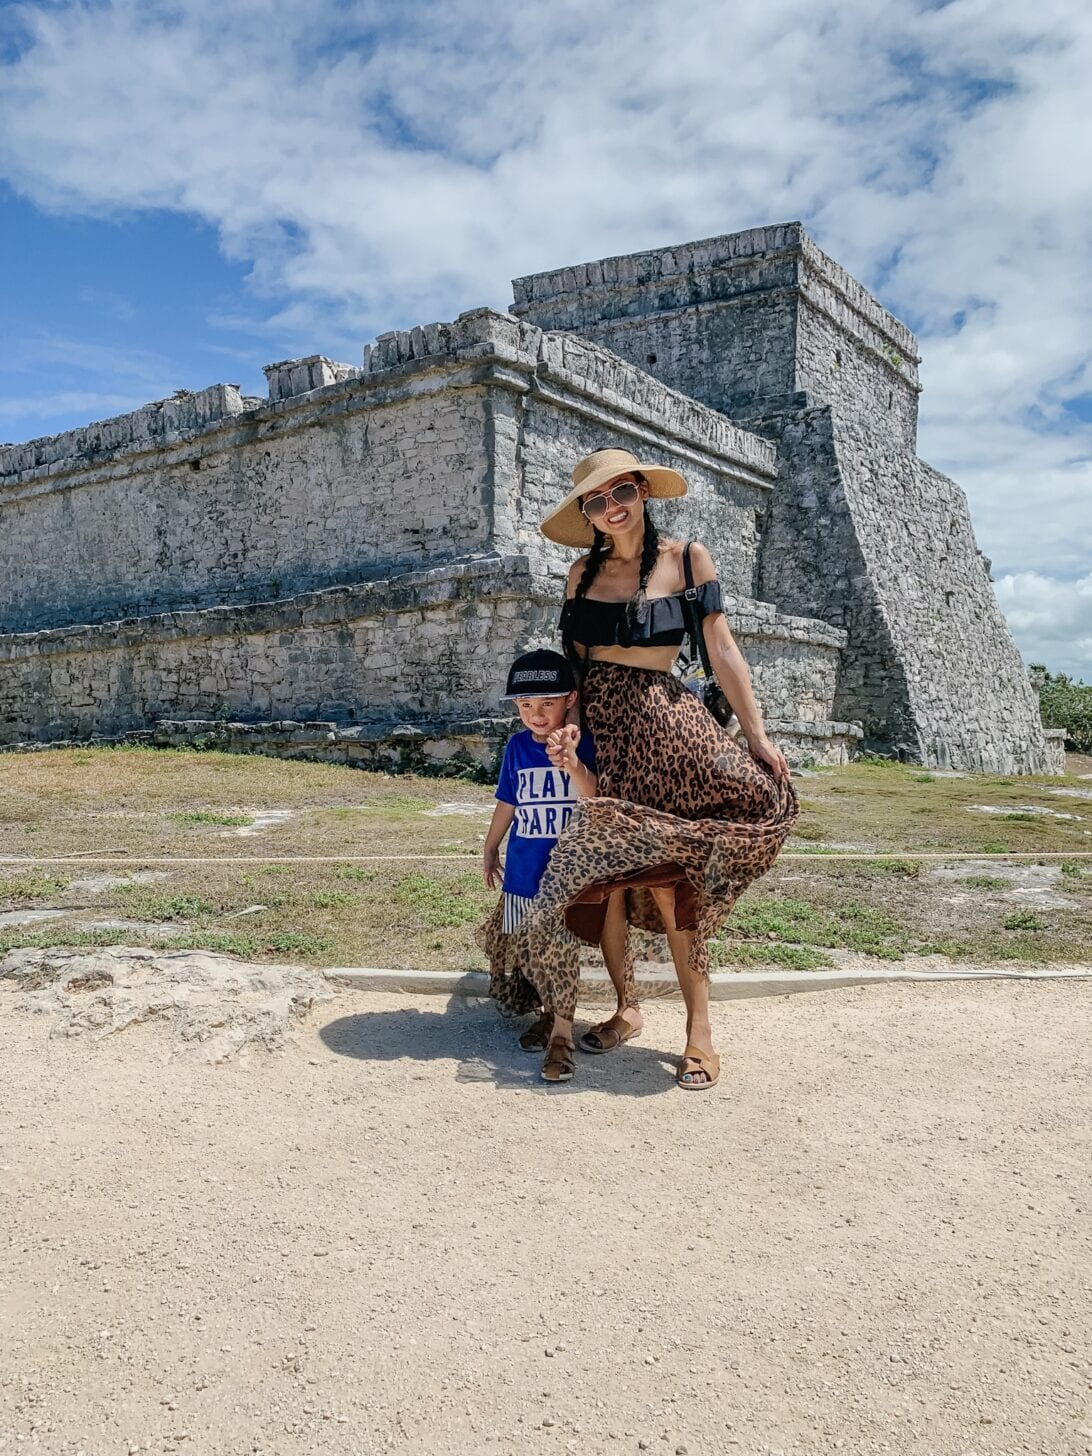 Tulum Travel guide, Tulum ruins, Mayan Ruins